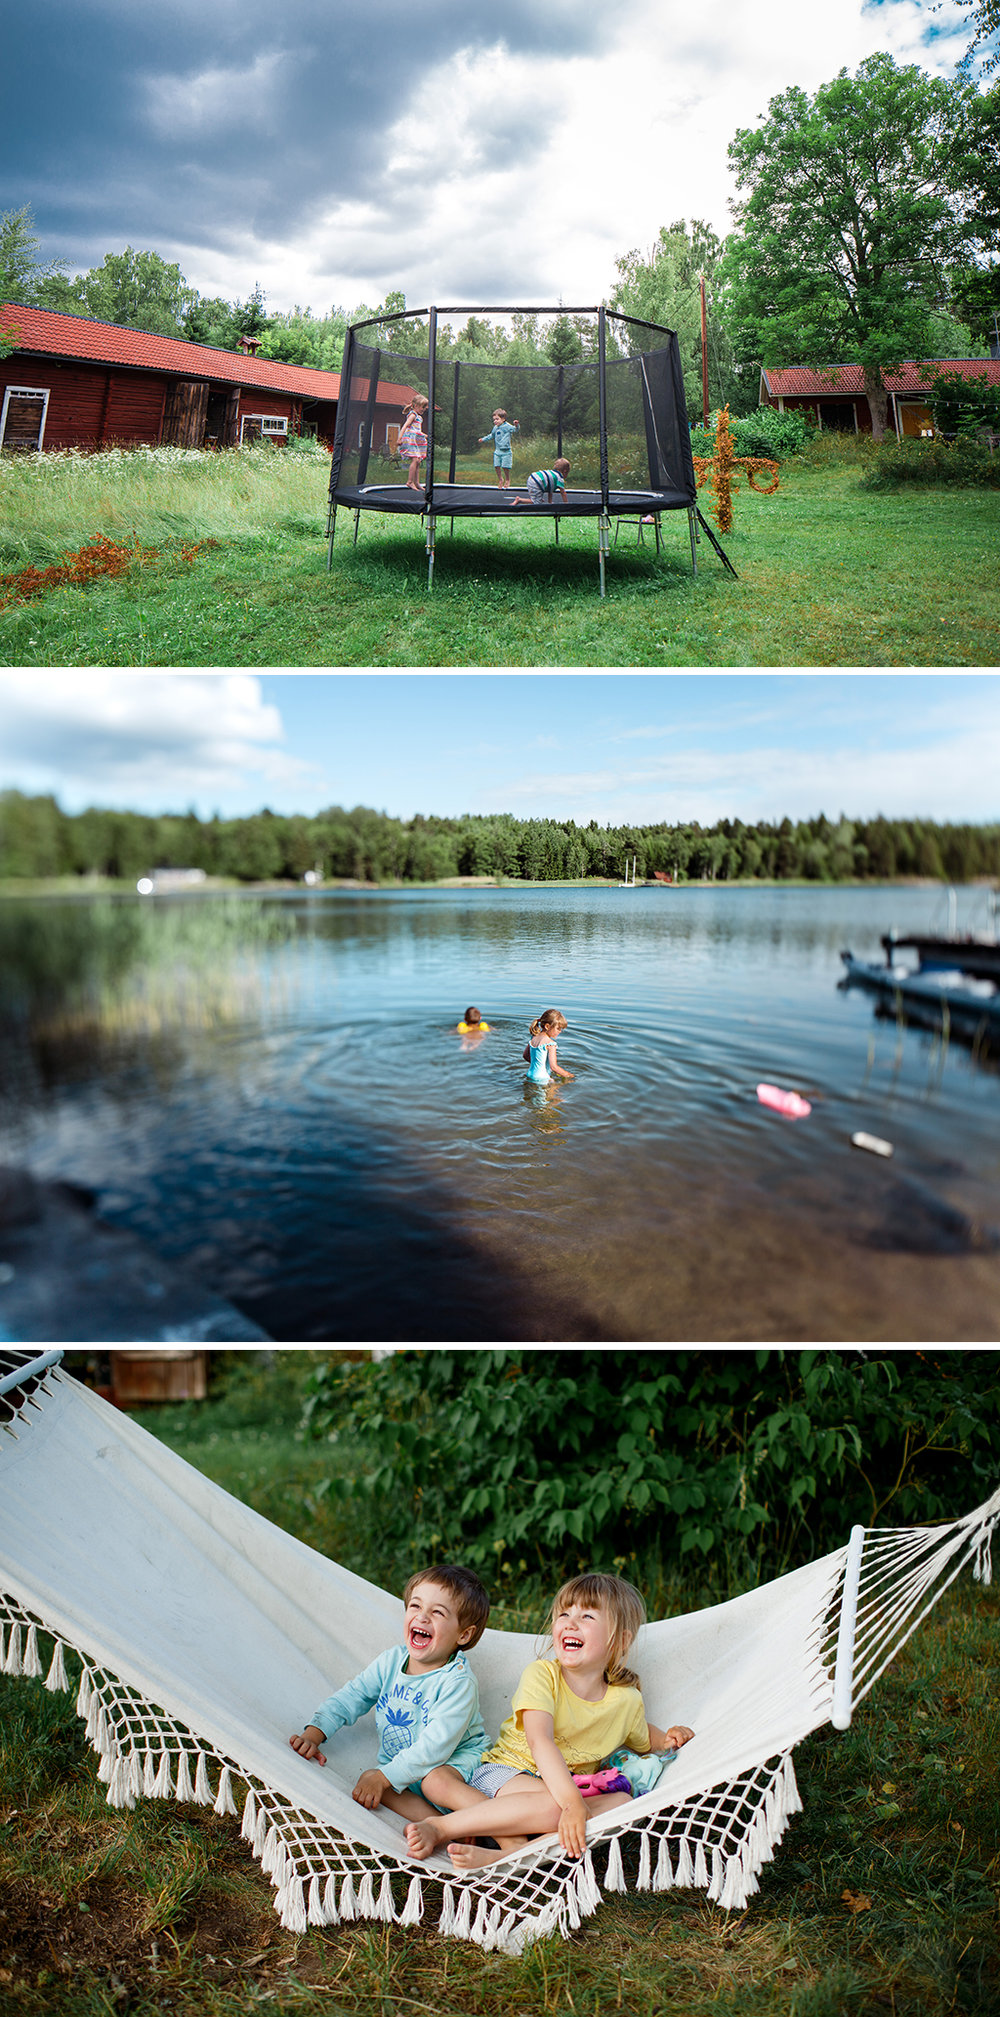 Lifestyle-familjefotograf_Stockholm_Sommar_barnfotografering_1.jpg